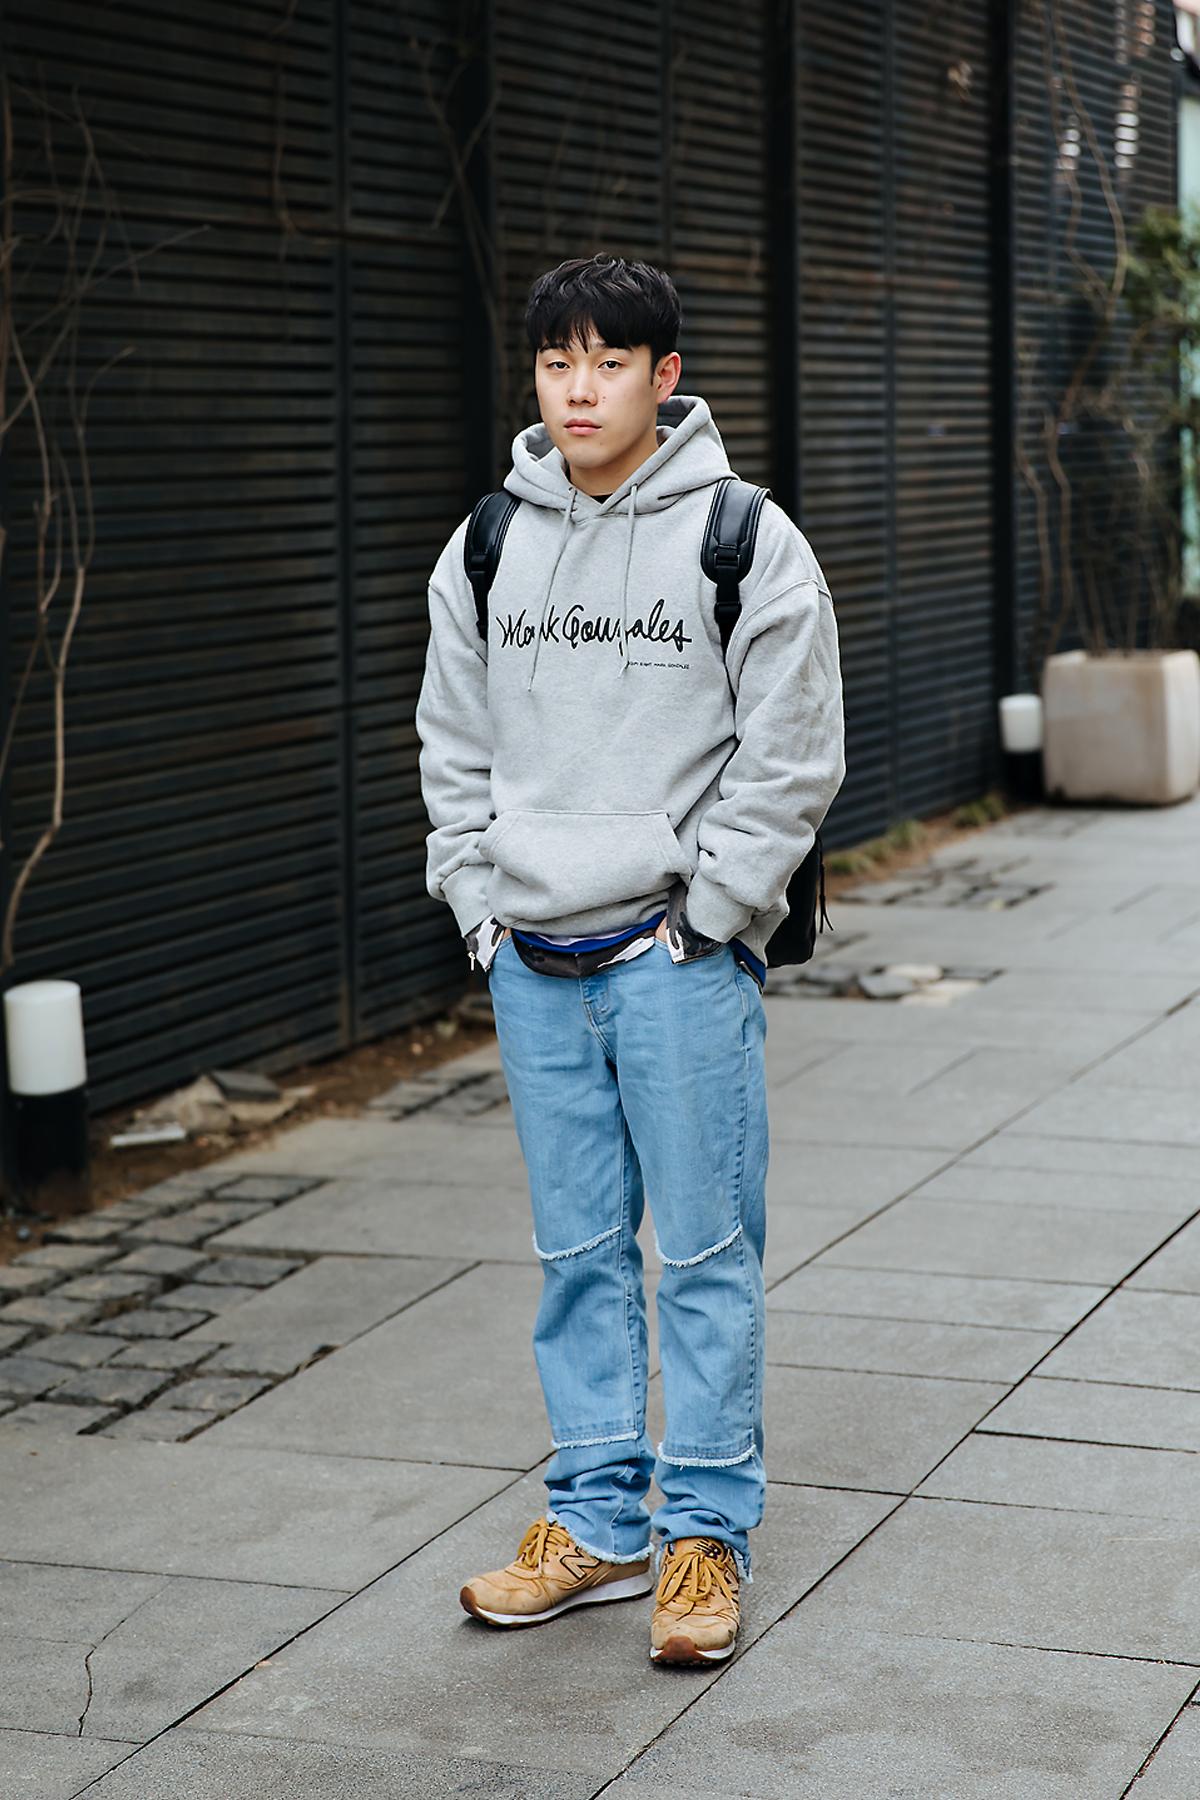 Street Fashion - 7